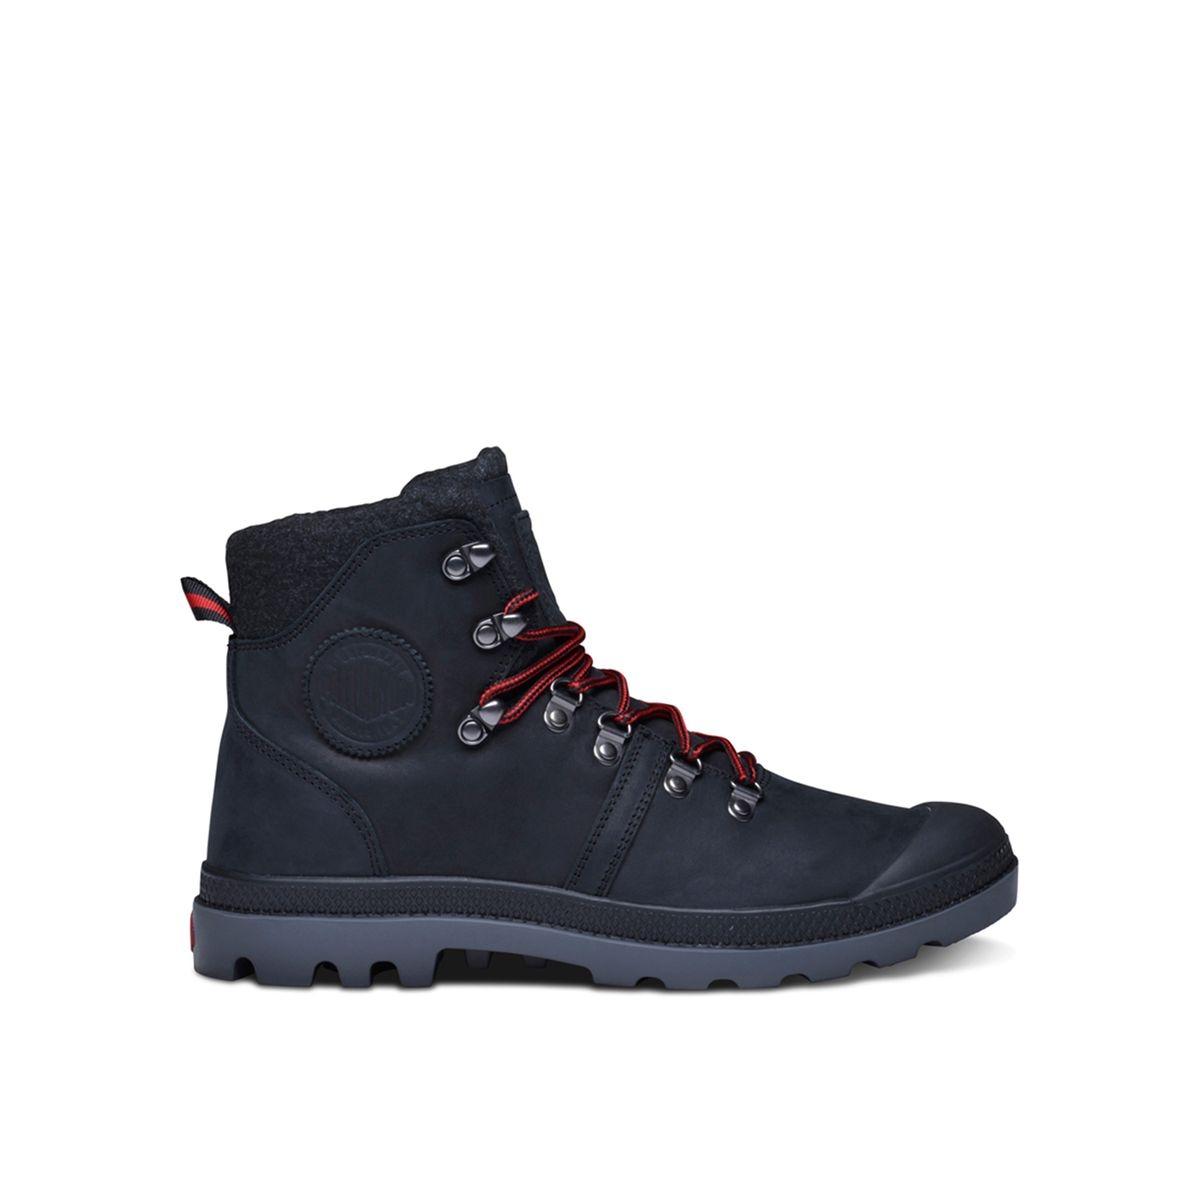 Boots type montagne 74421 PALLAB HIKR H